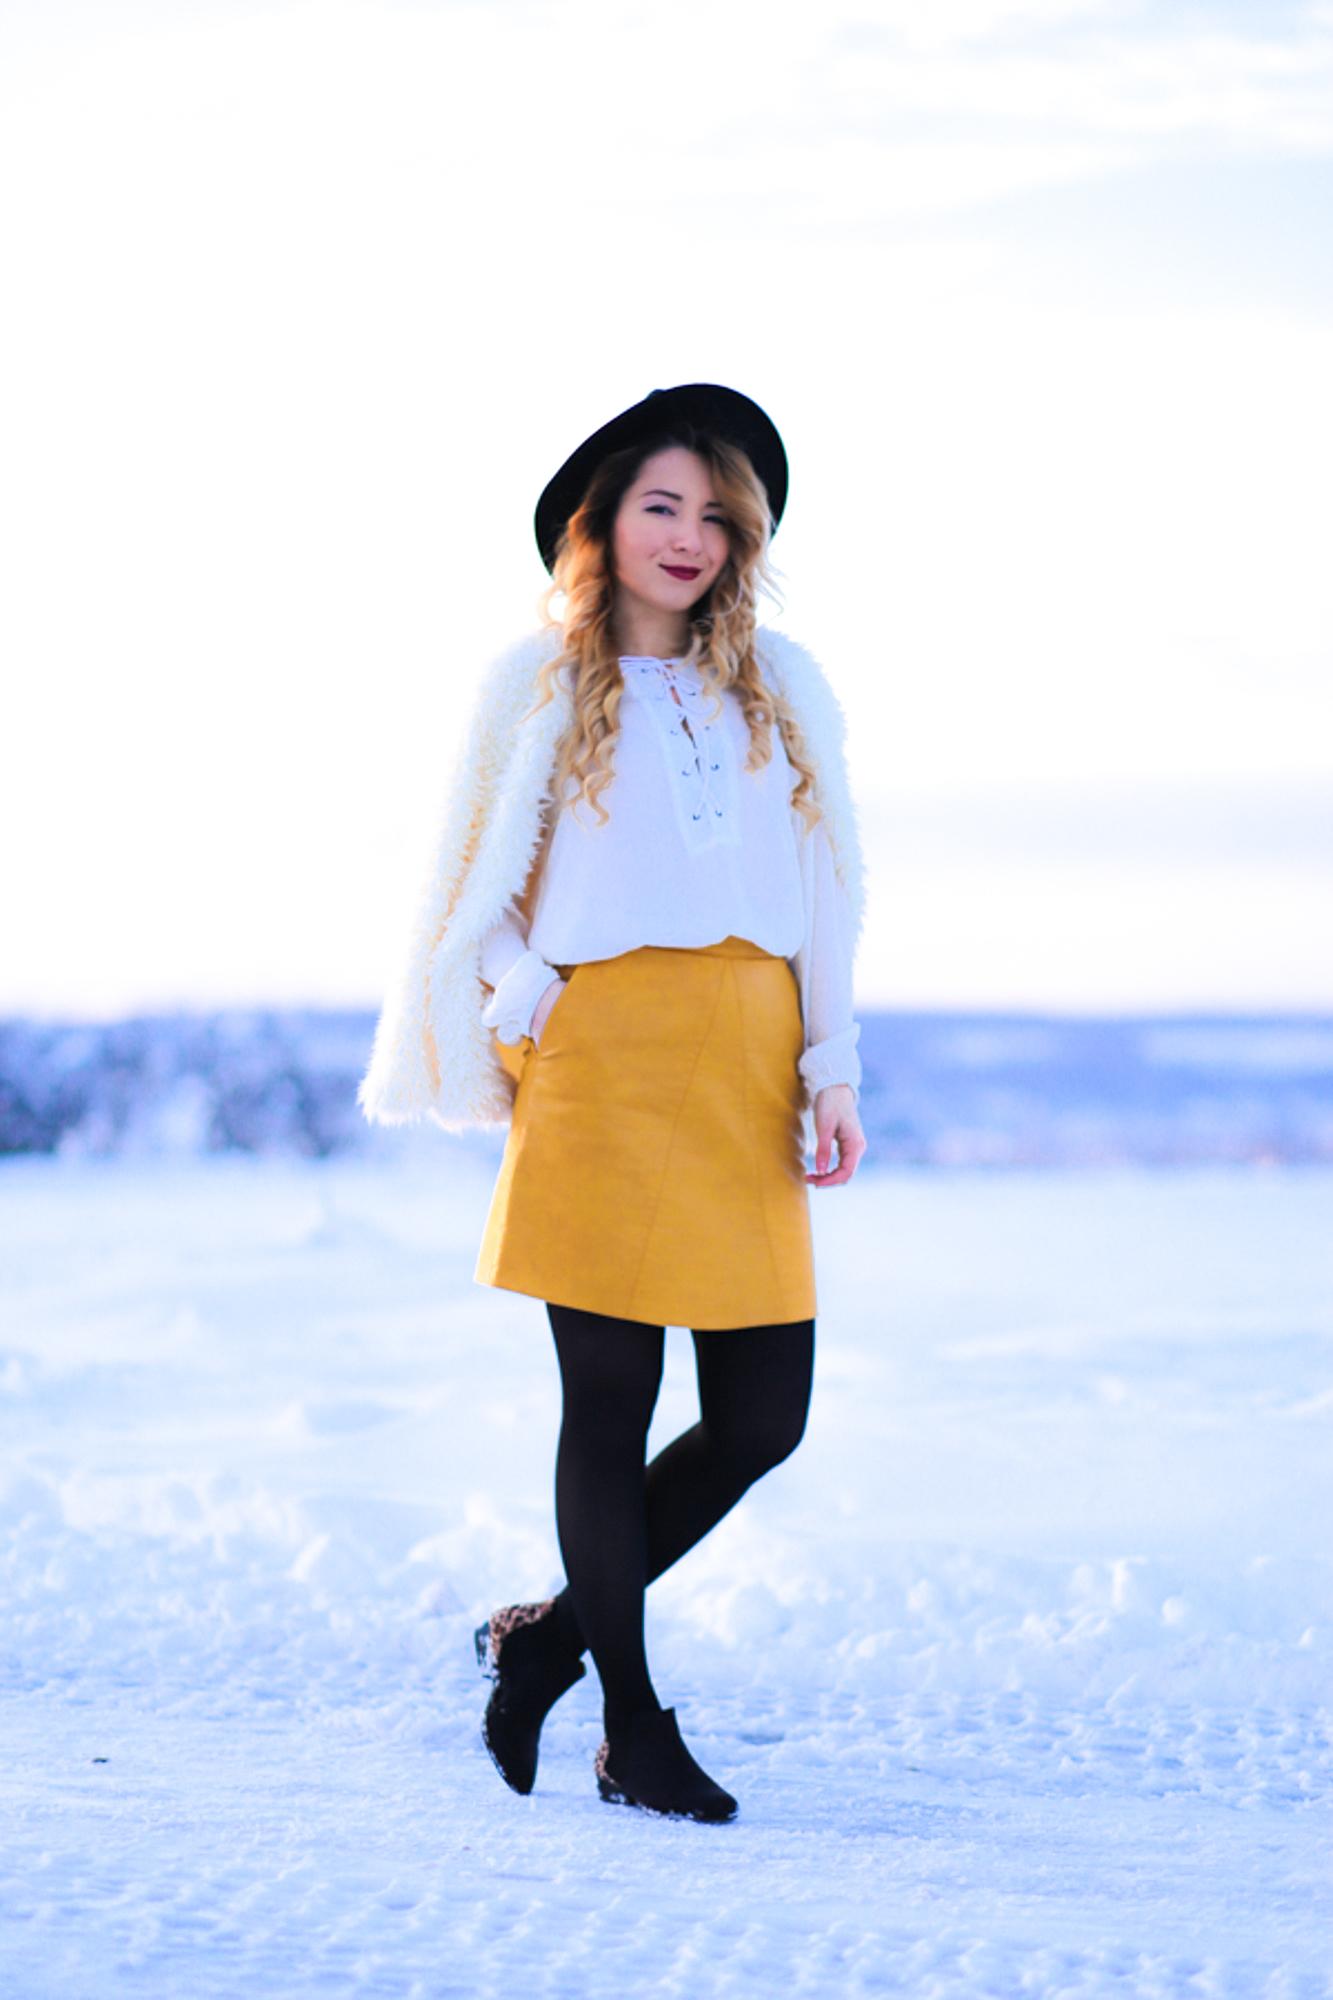 Apus de iarna - postare blog